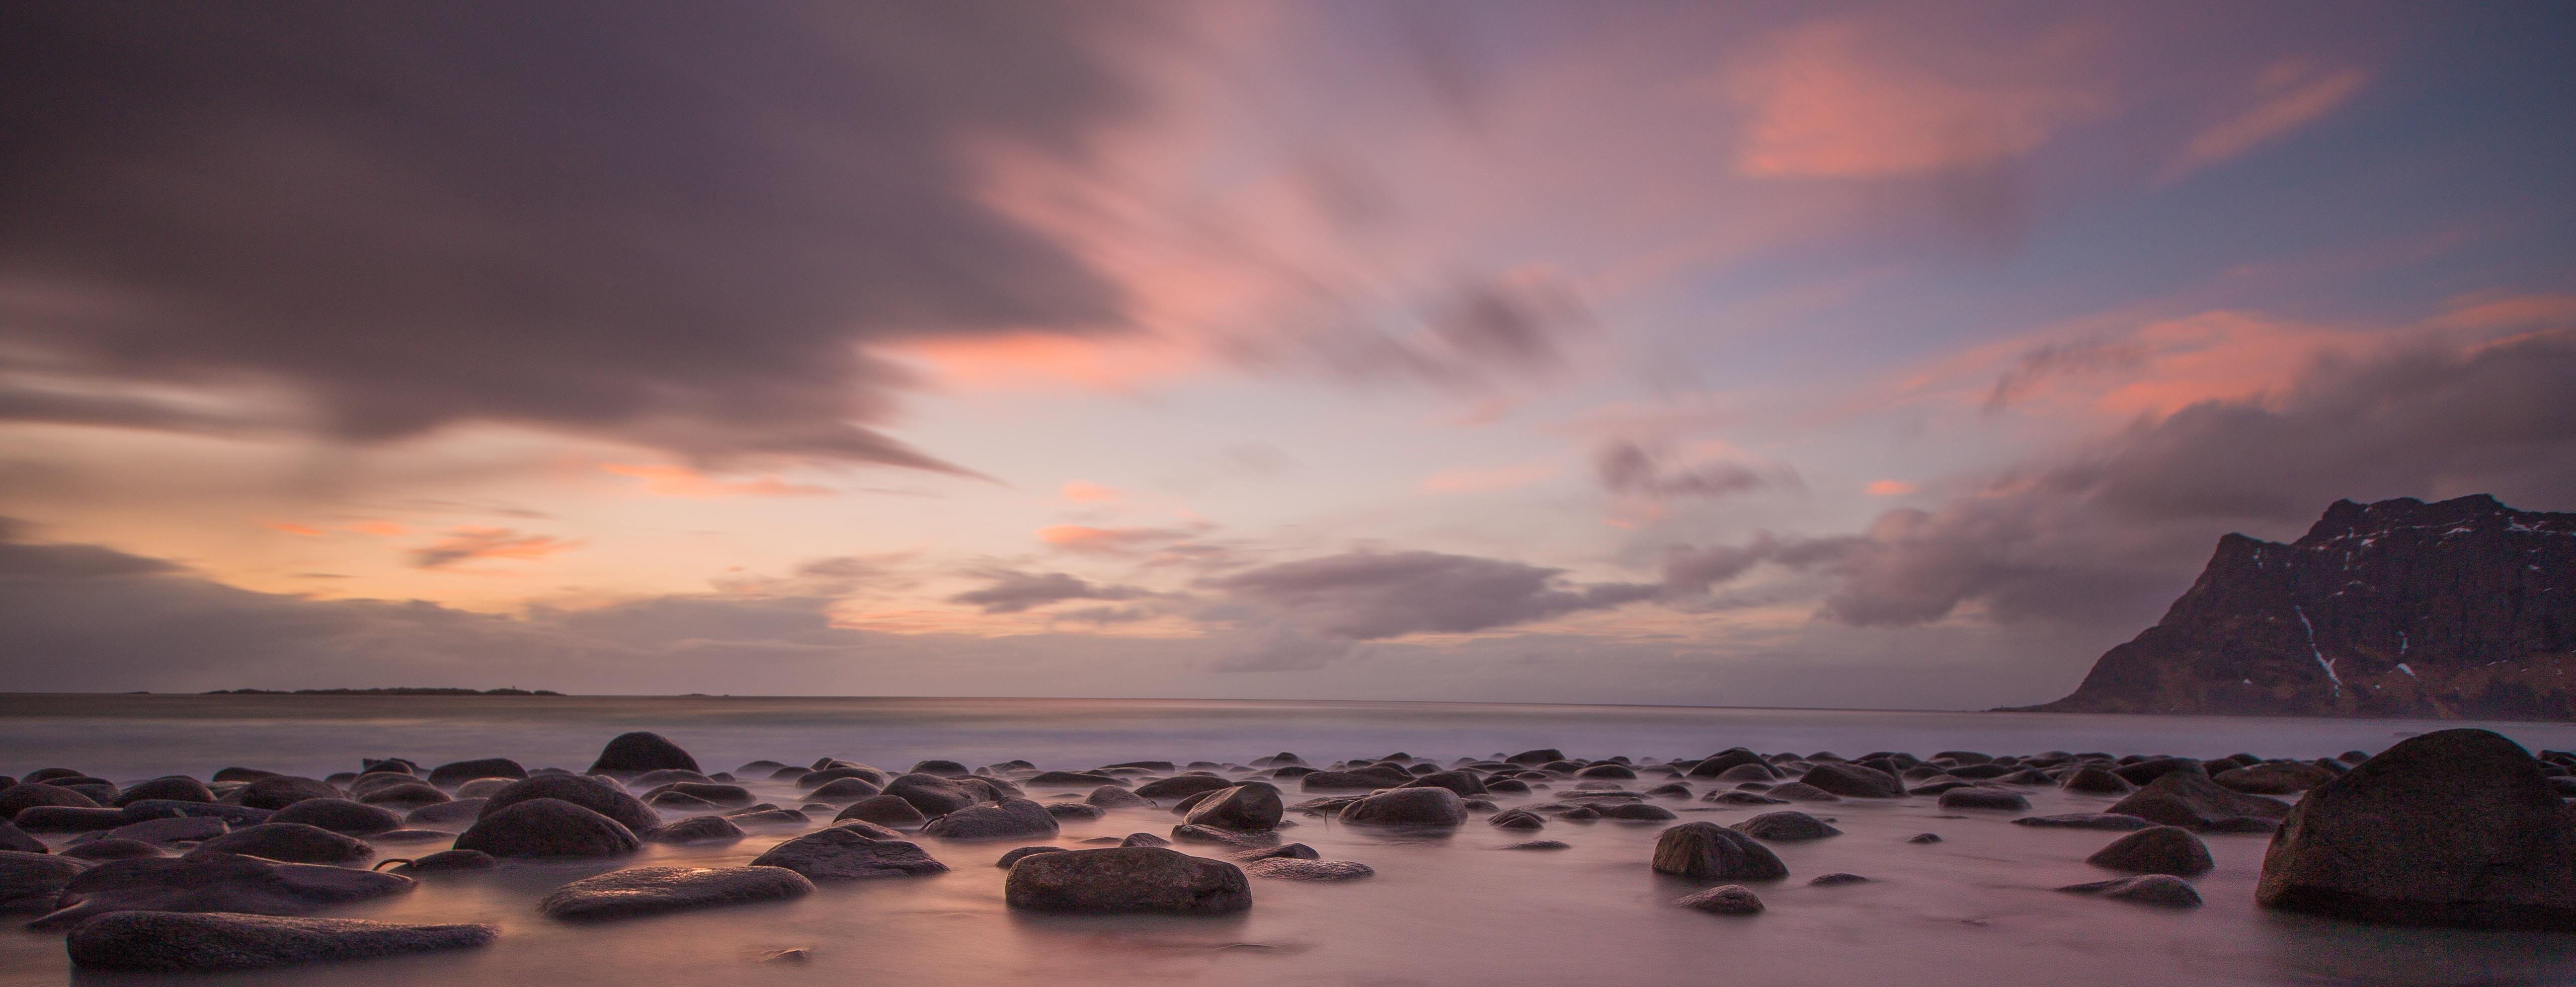 rock formation near shoreline during golden hour